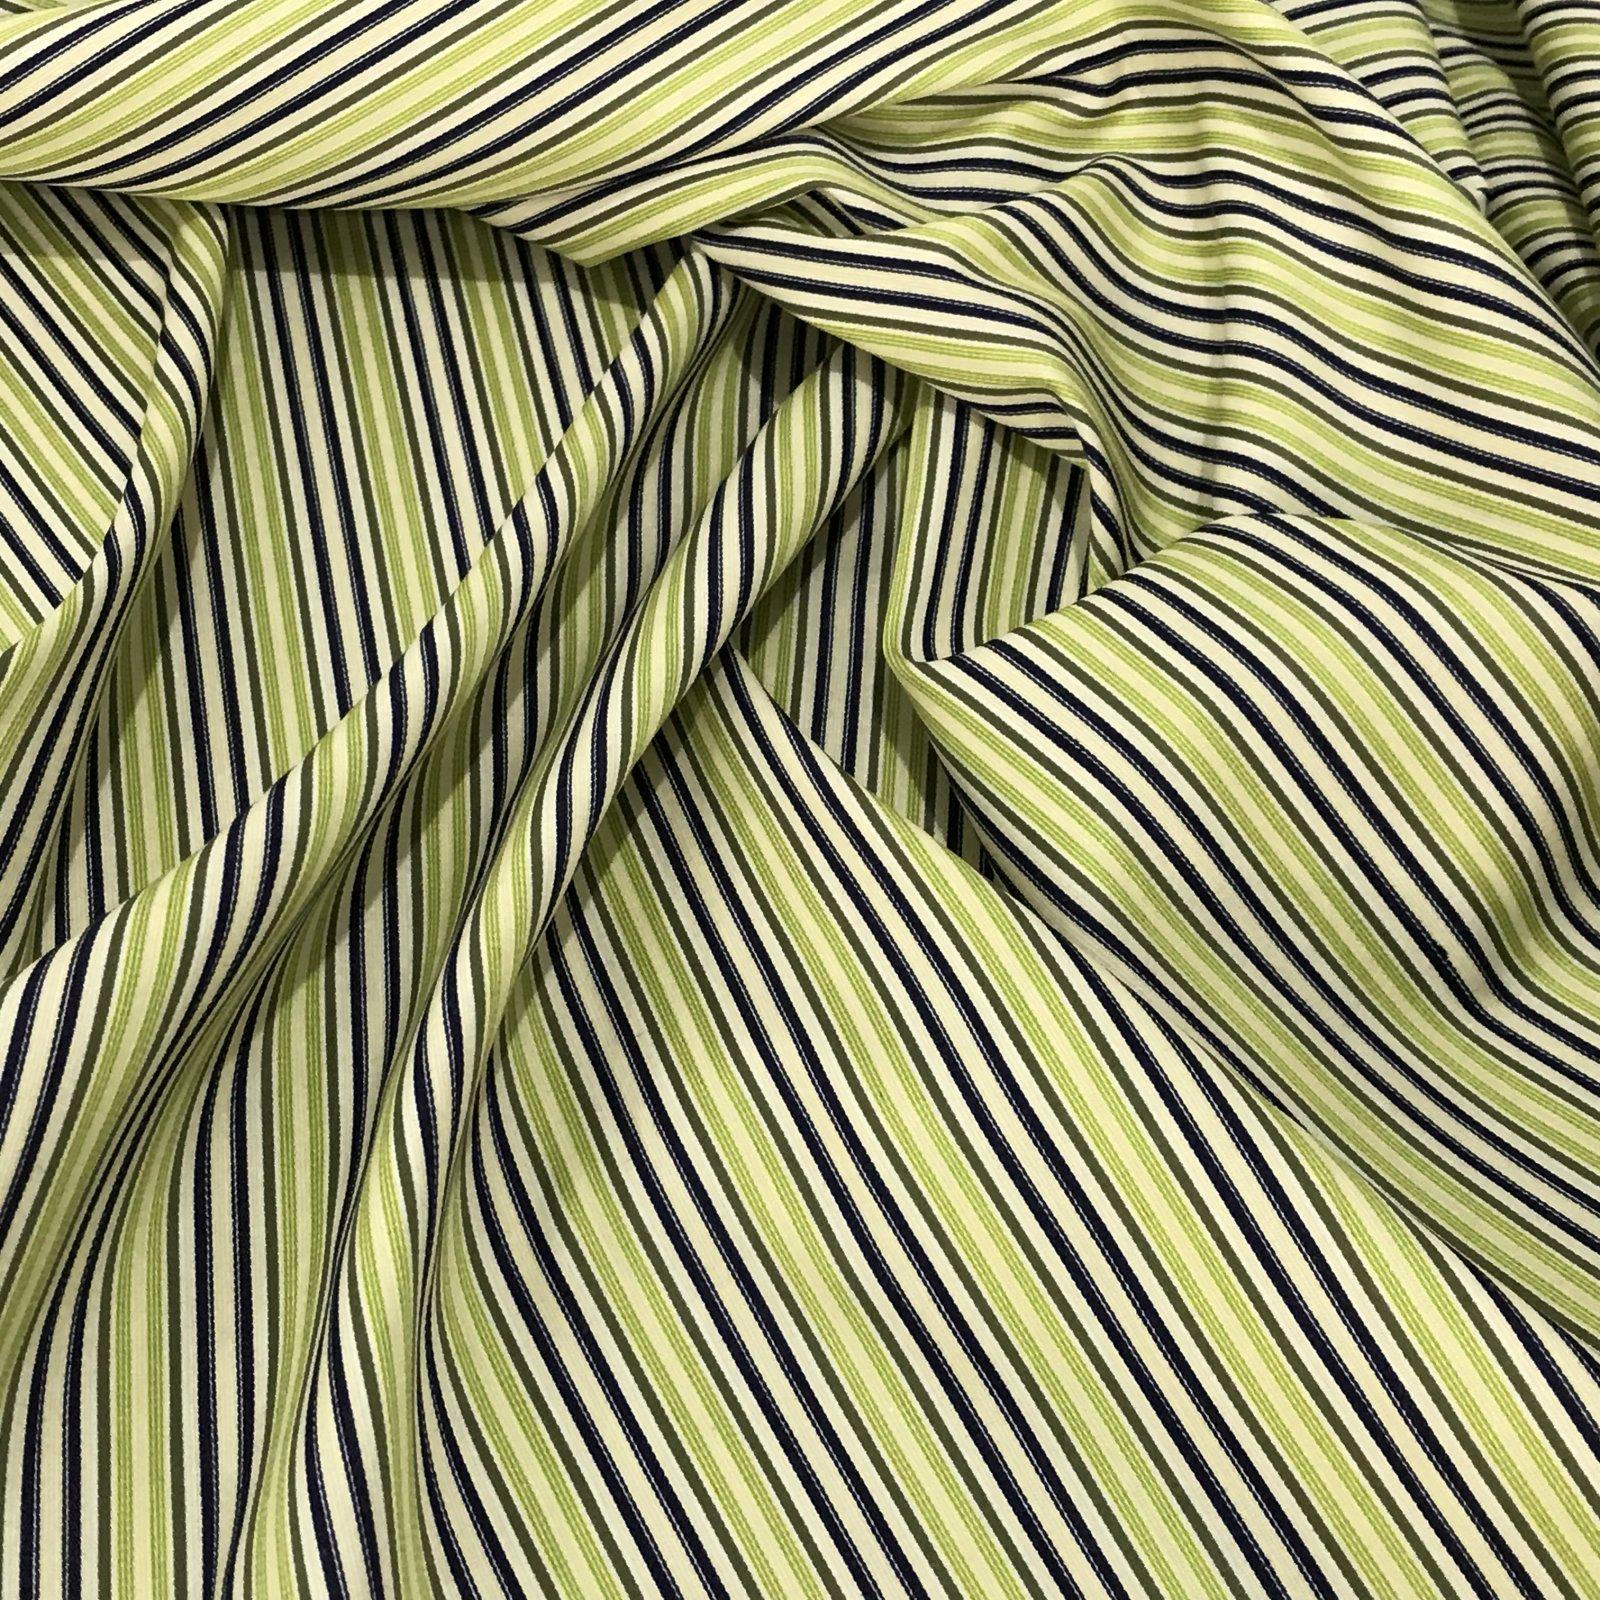 Cotton - Bright Spring Stripes